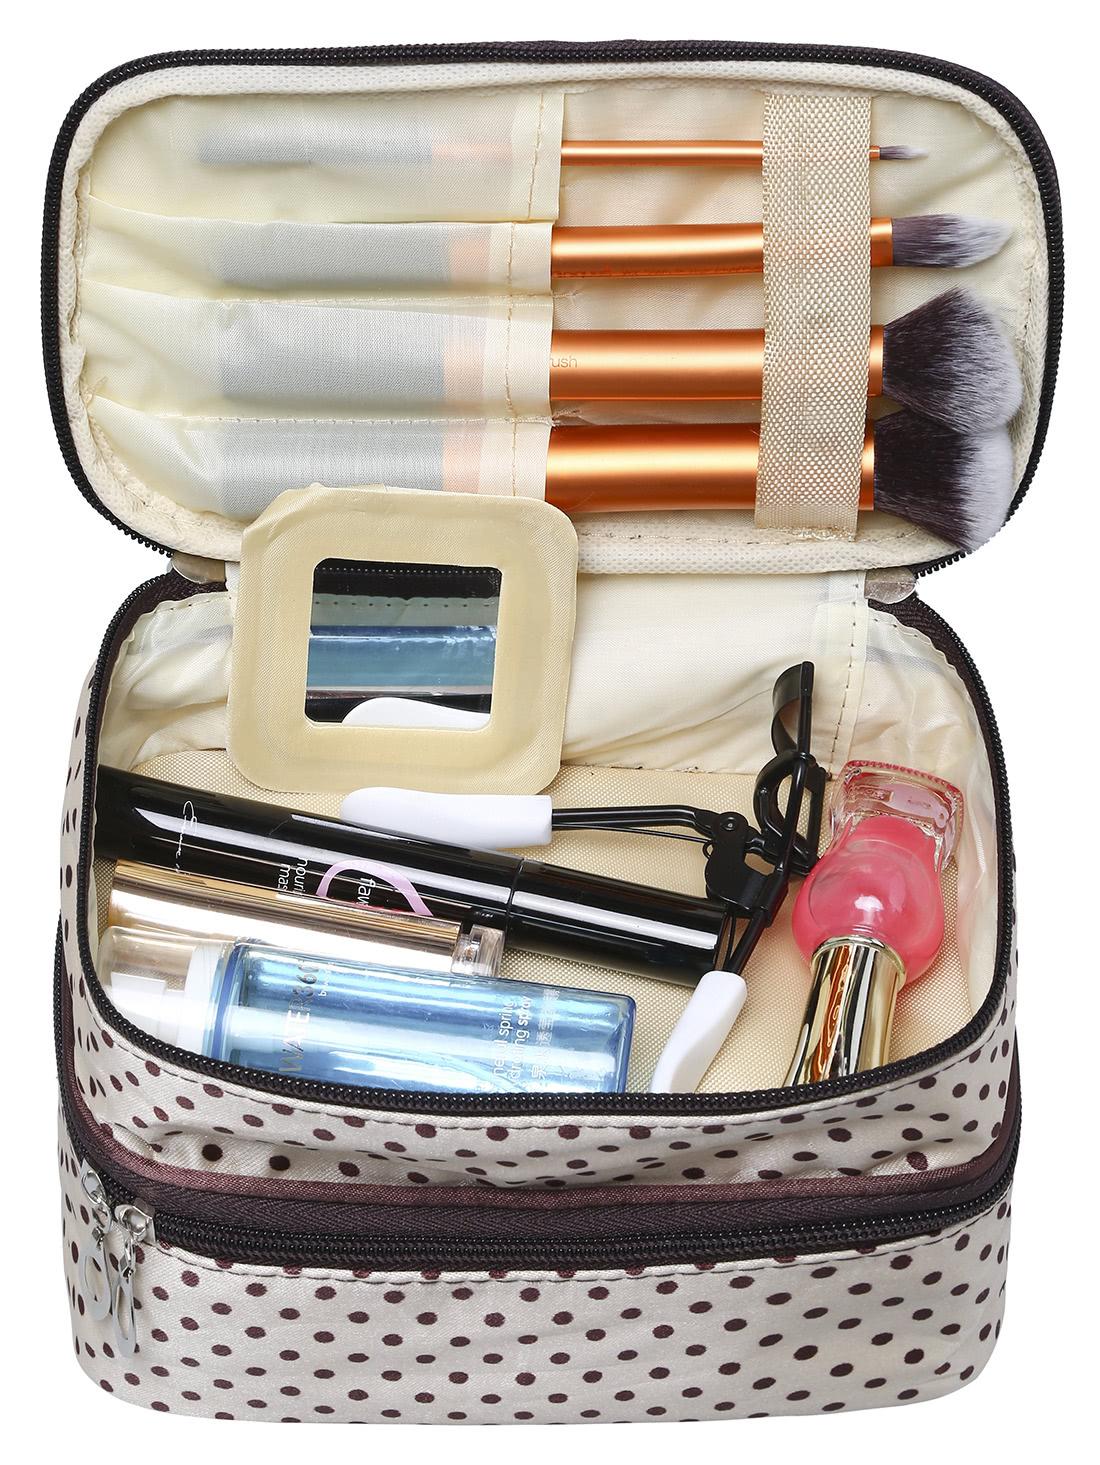 Beige Polka Dot Double Layers Cosmetic Bag transer jasmine polka dot flip double zipper cosmetic bag 0213 drop shipping